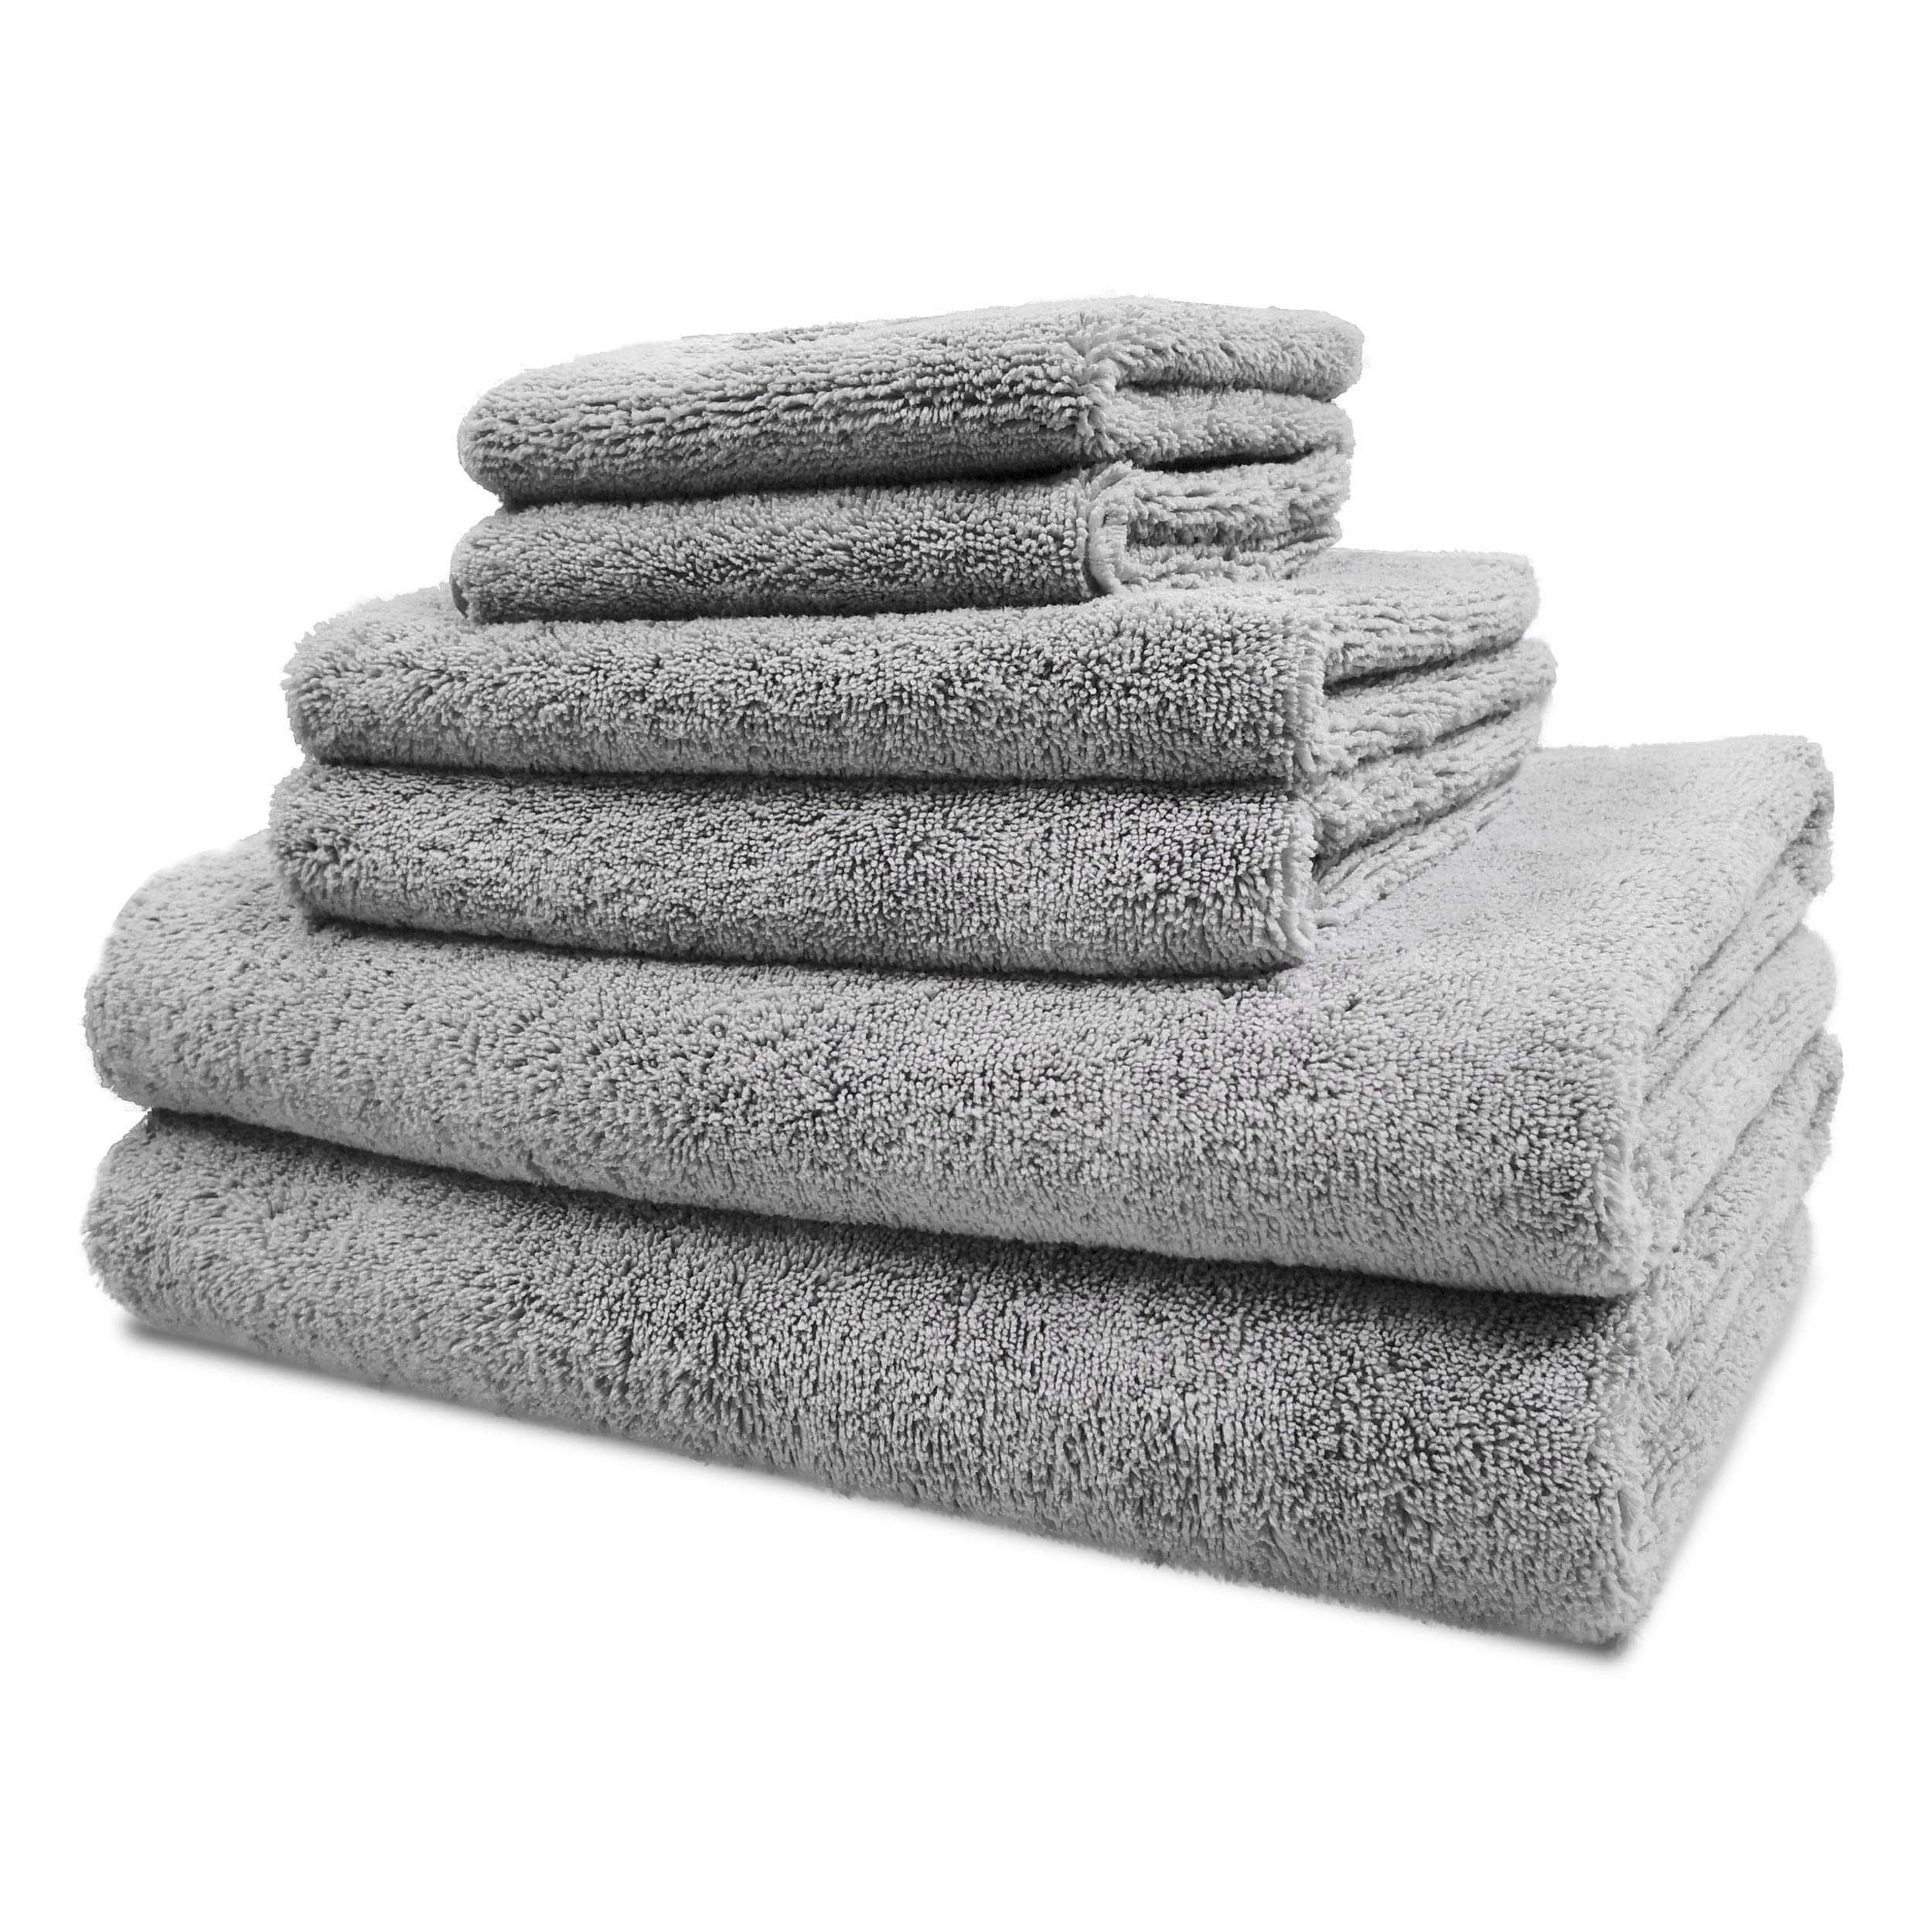 Polyte Luxury Quick Dry Lint Free Microfiber Bath Towel Set, 6 Piece (Gray) by Polyte